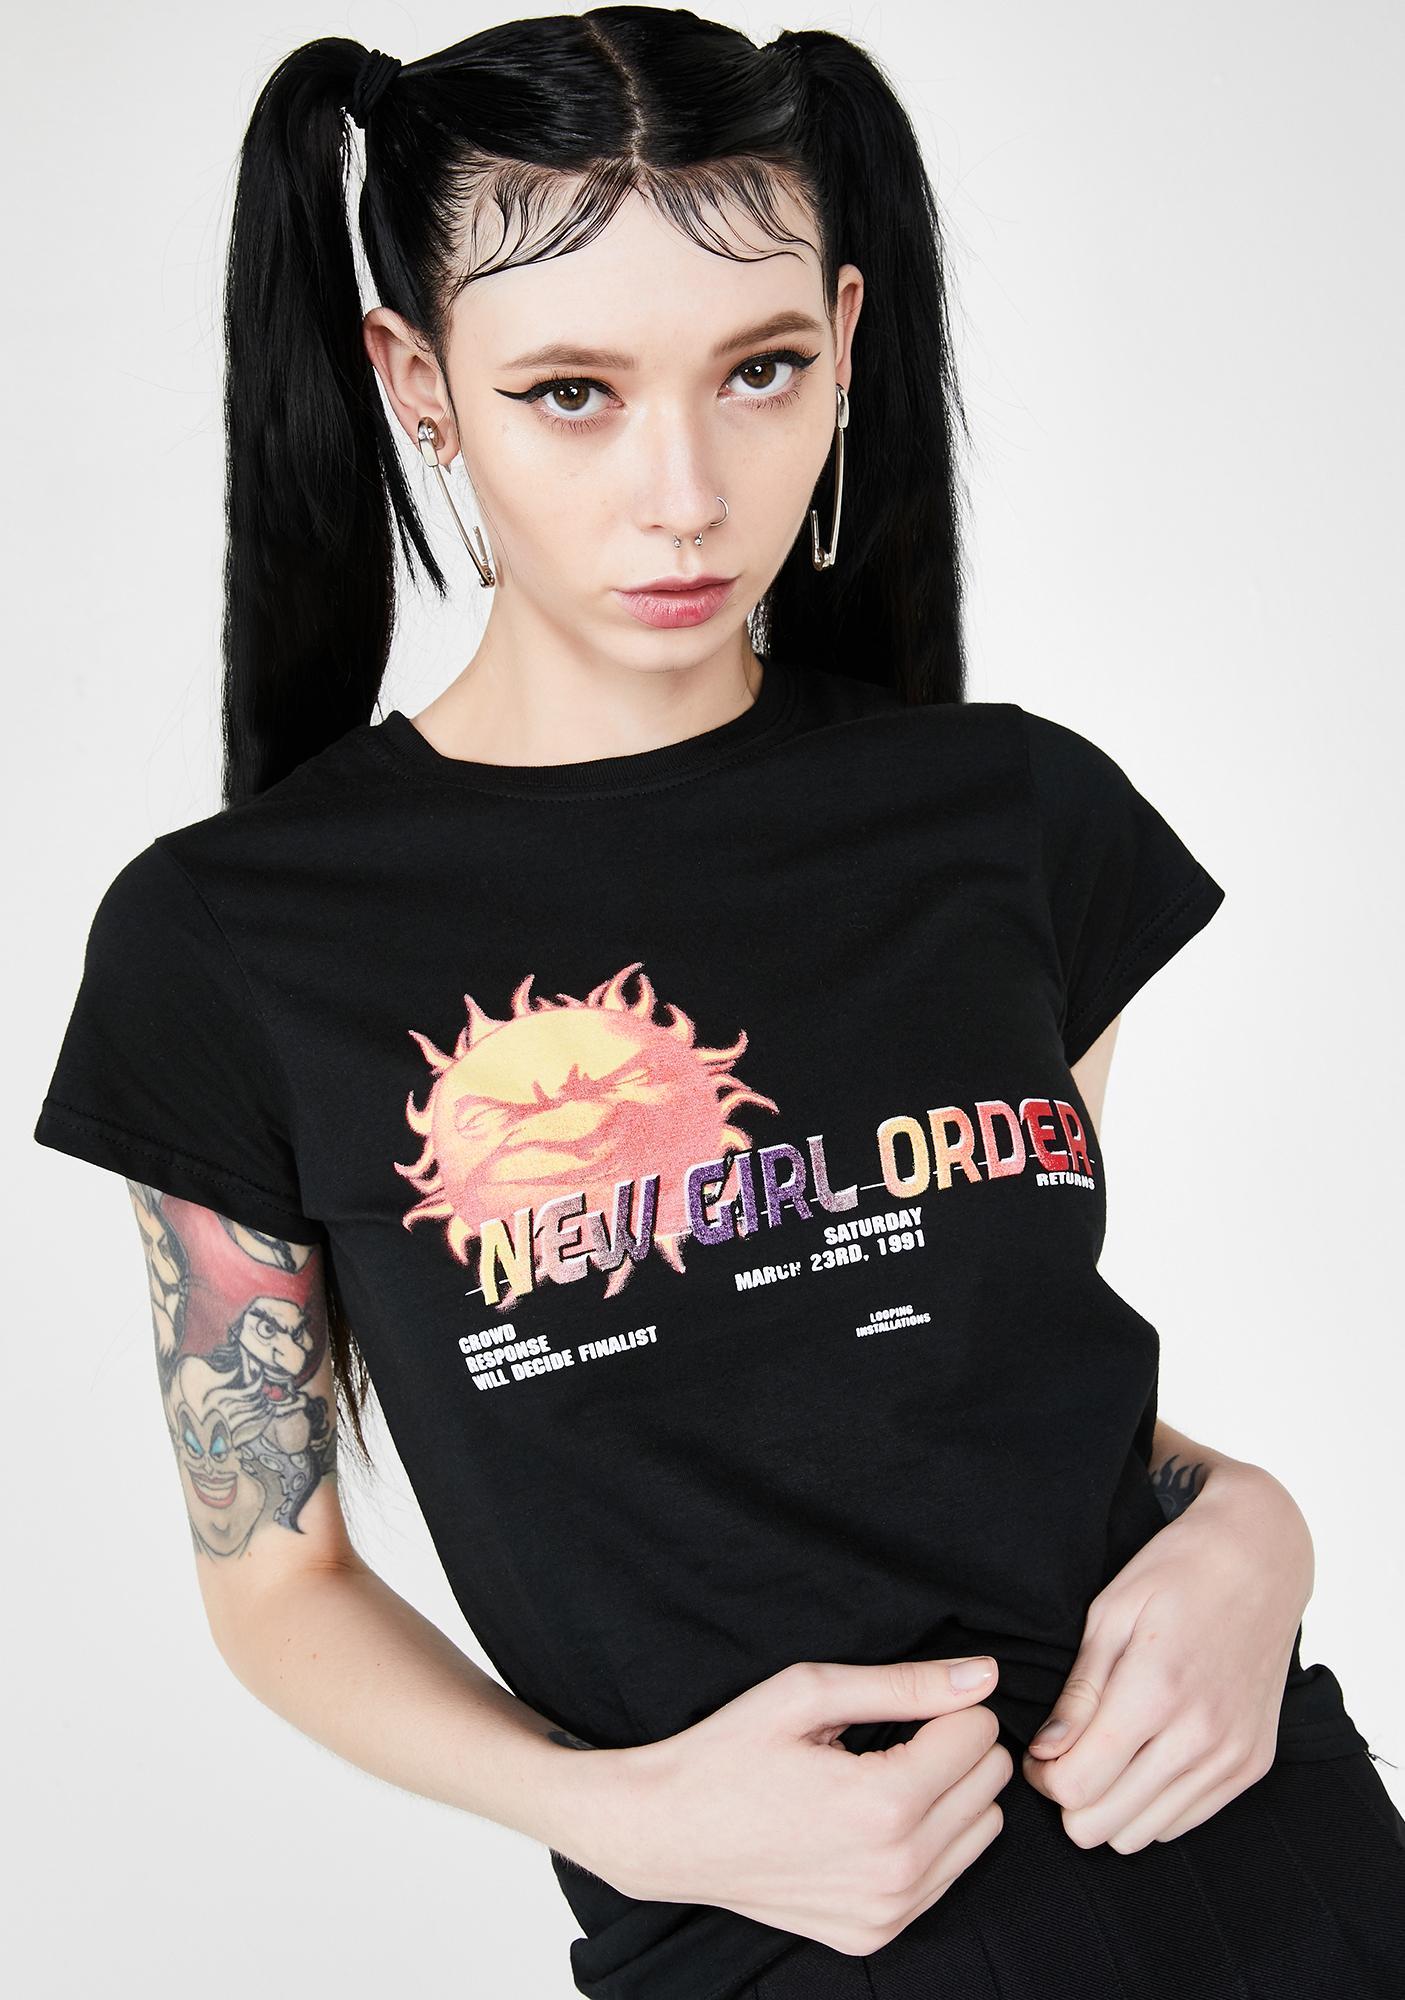 NEW GIRL ORDER Rave Tee